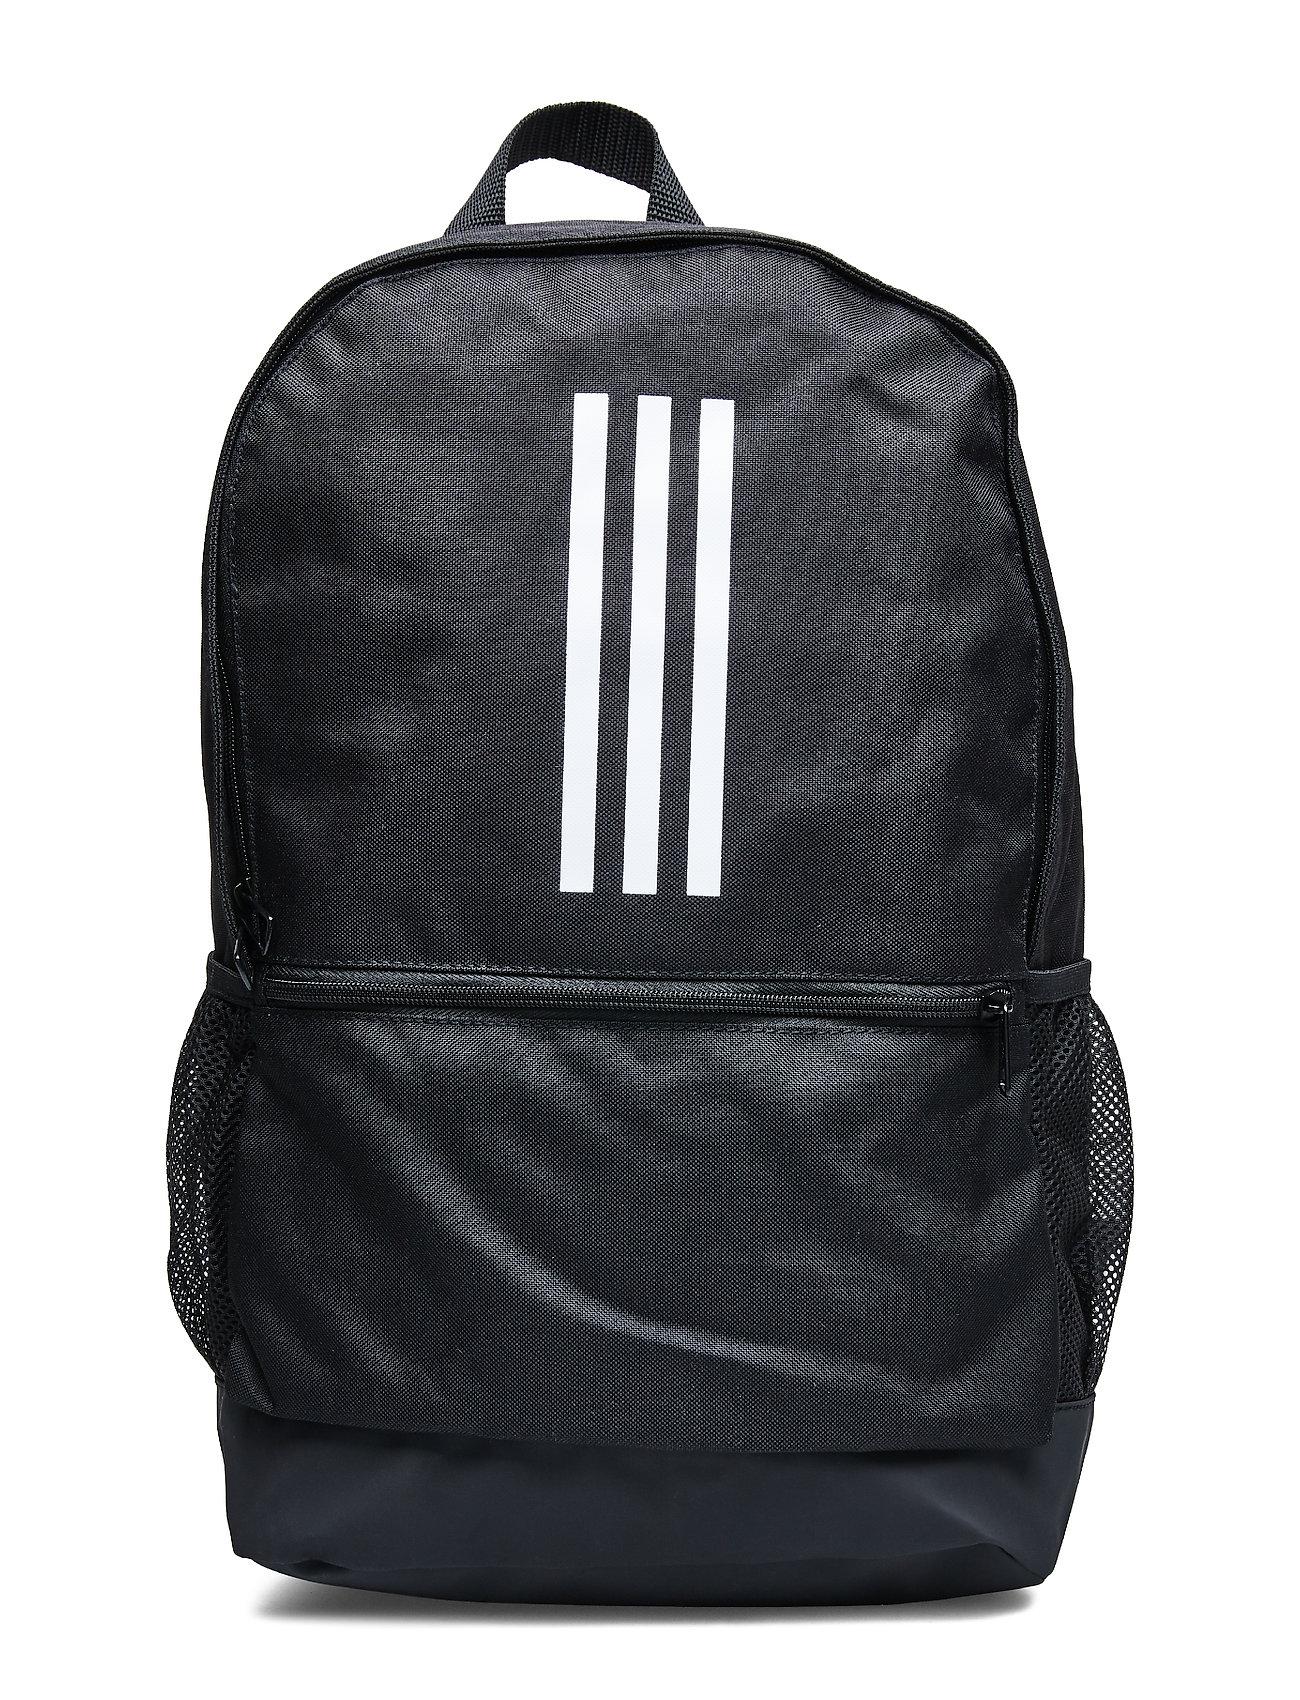 adidas Performance TIRO BP - BLACK/WHITE